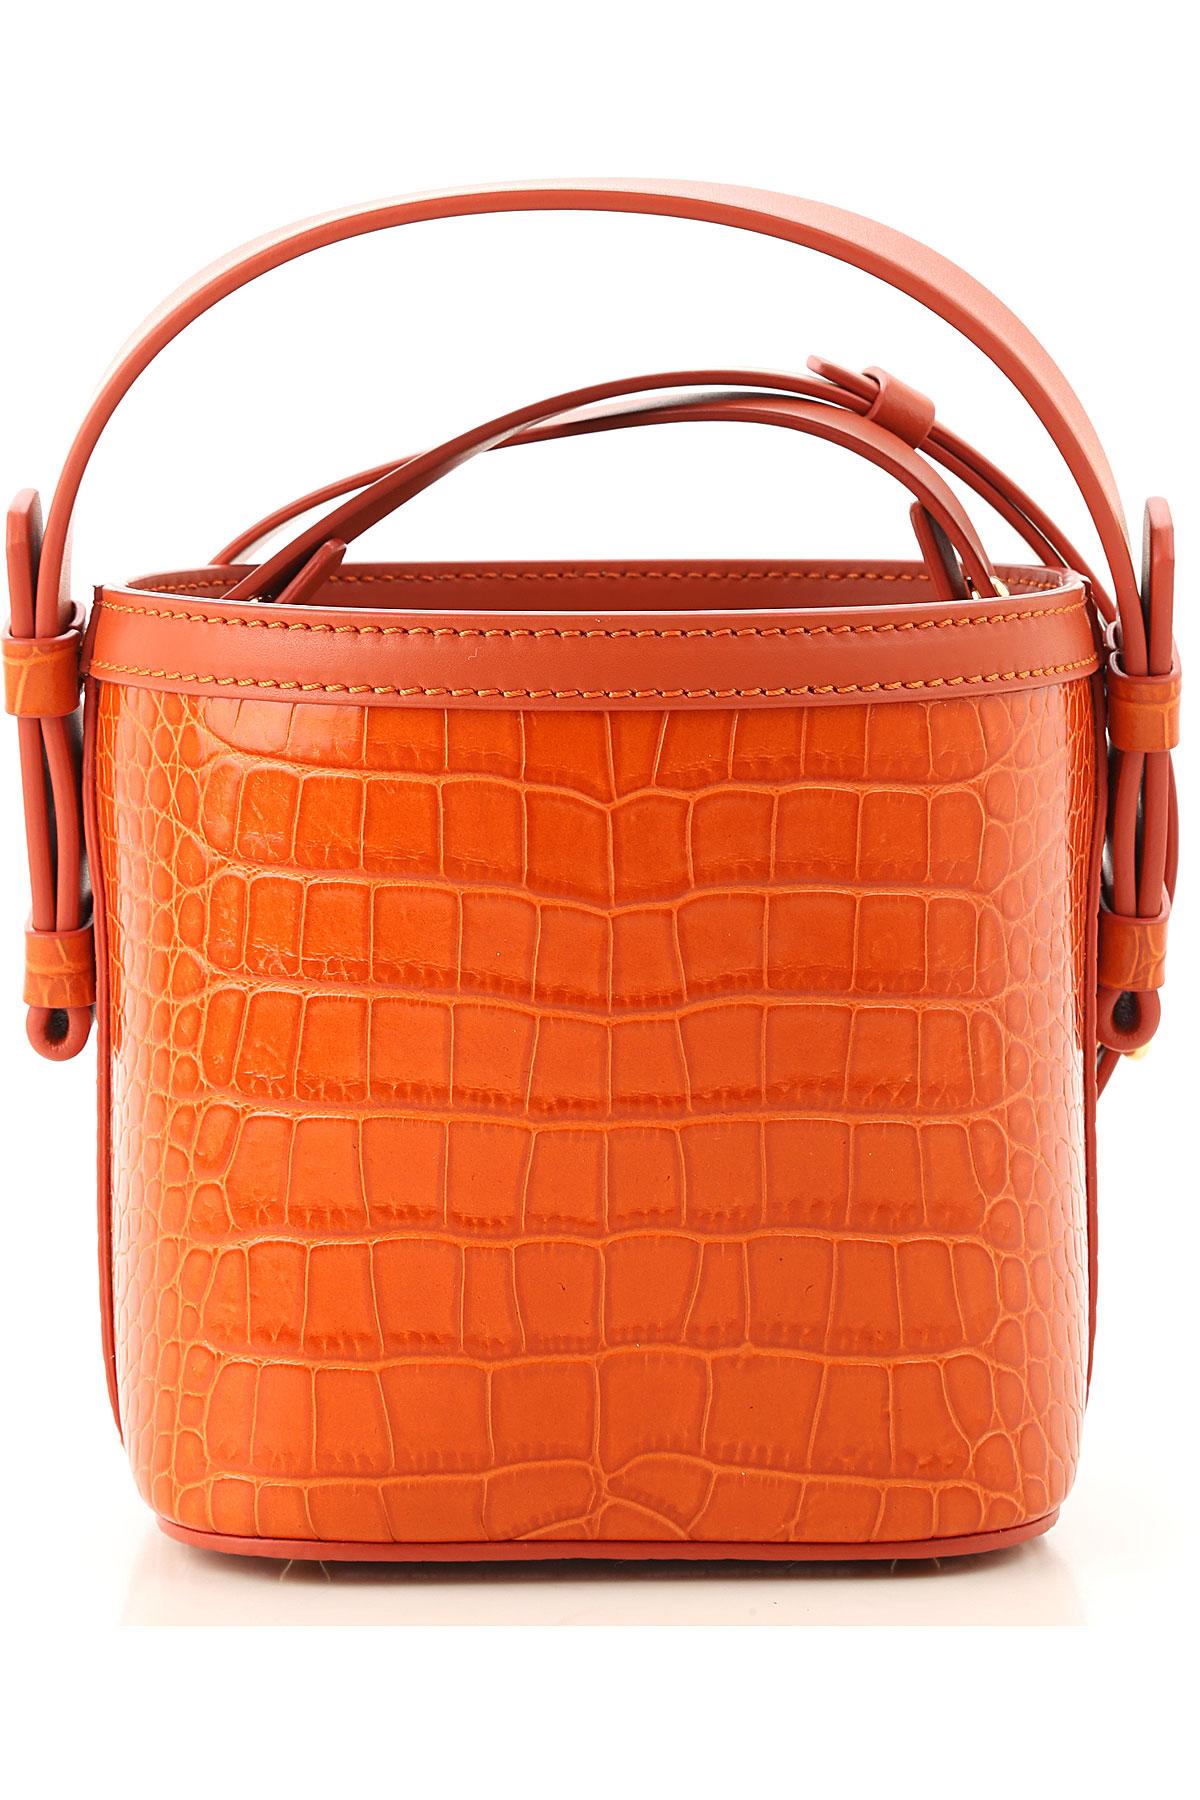 Nico Giani Shoulder Bag for Women On Sale, Brick, Leather, 2019